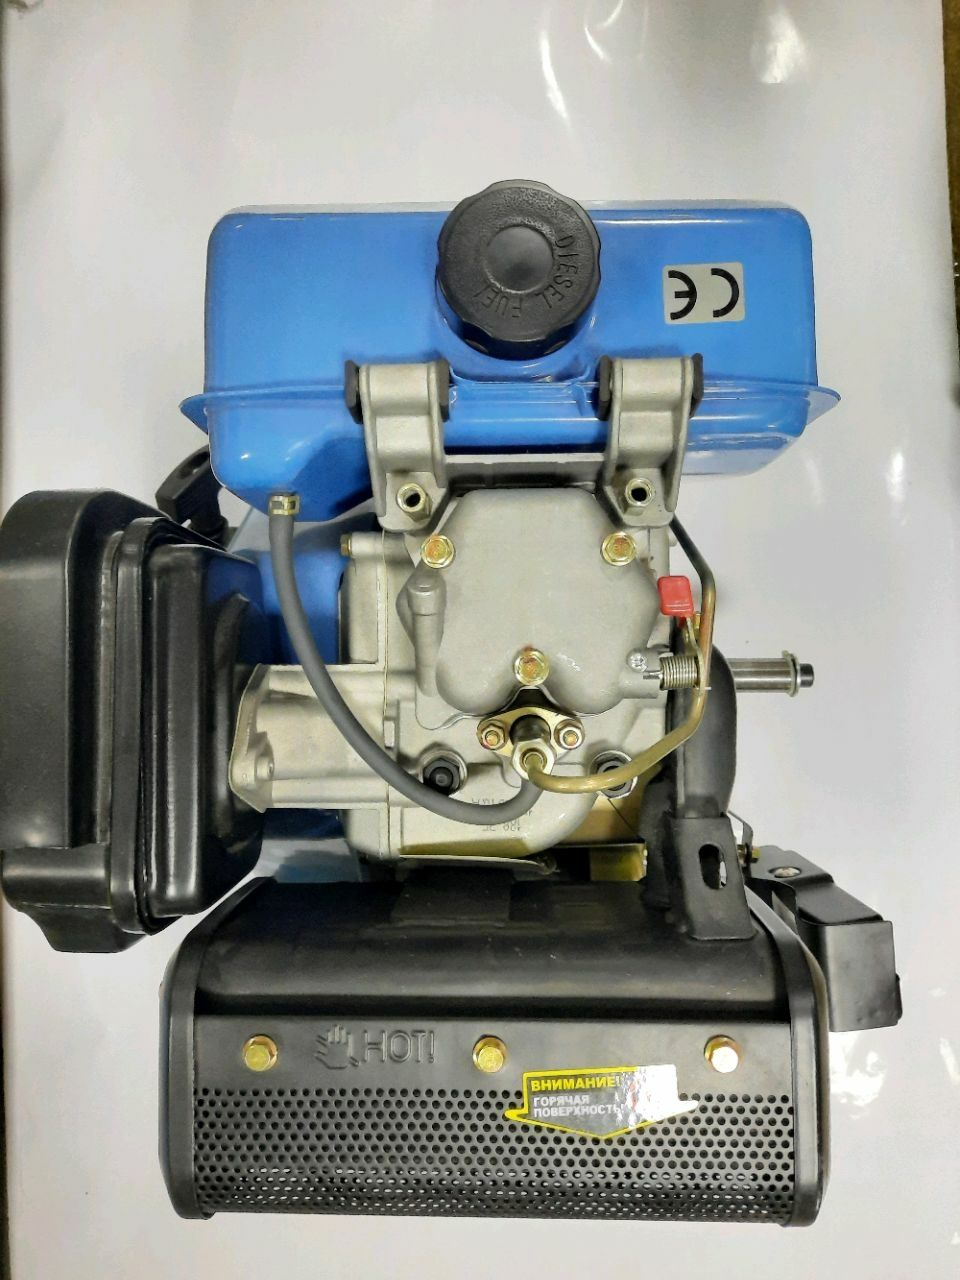 Motor Dizel 11 cp, start elect.